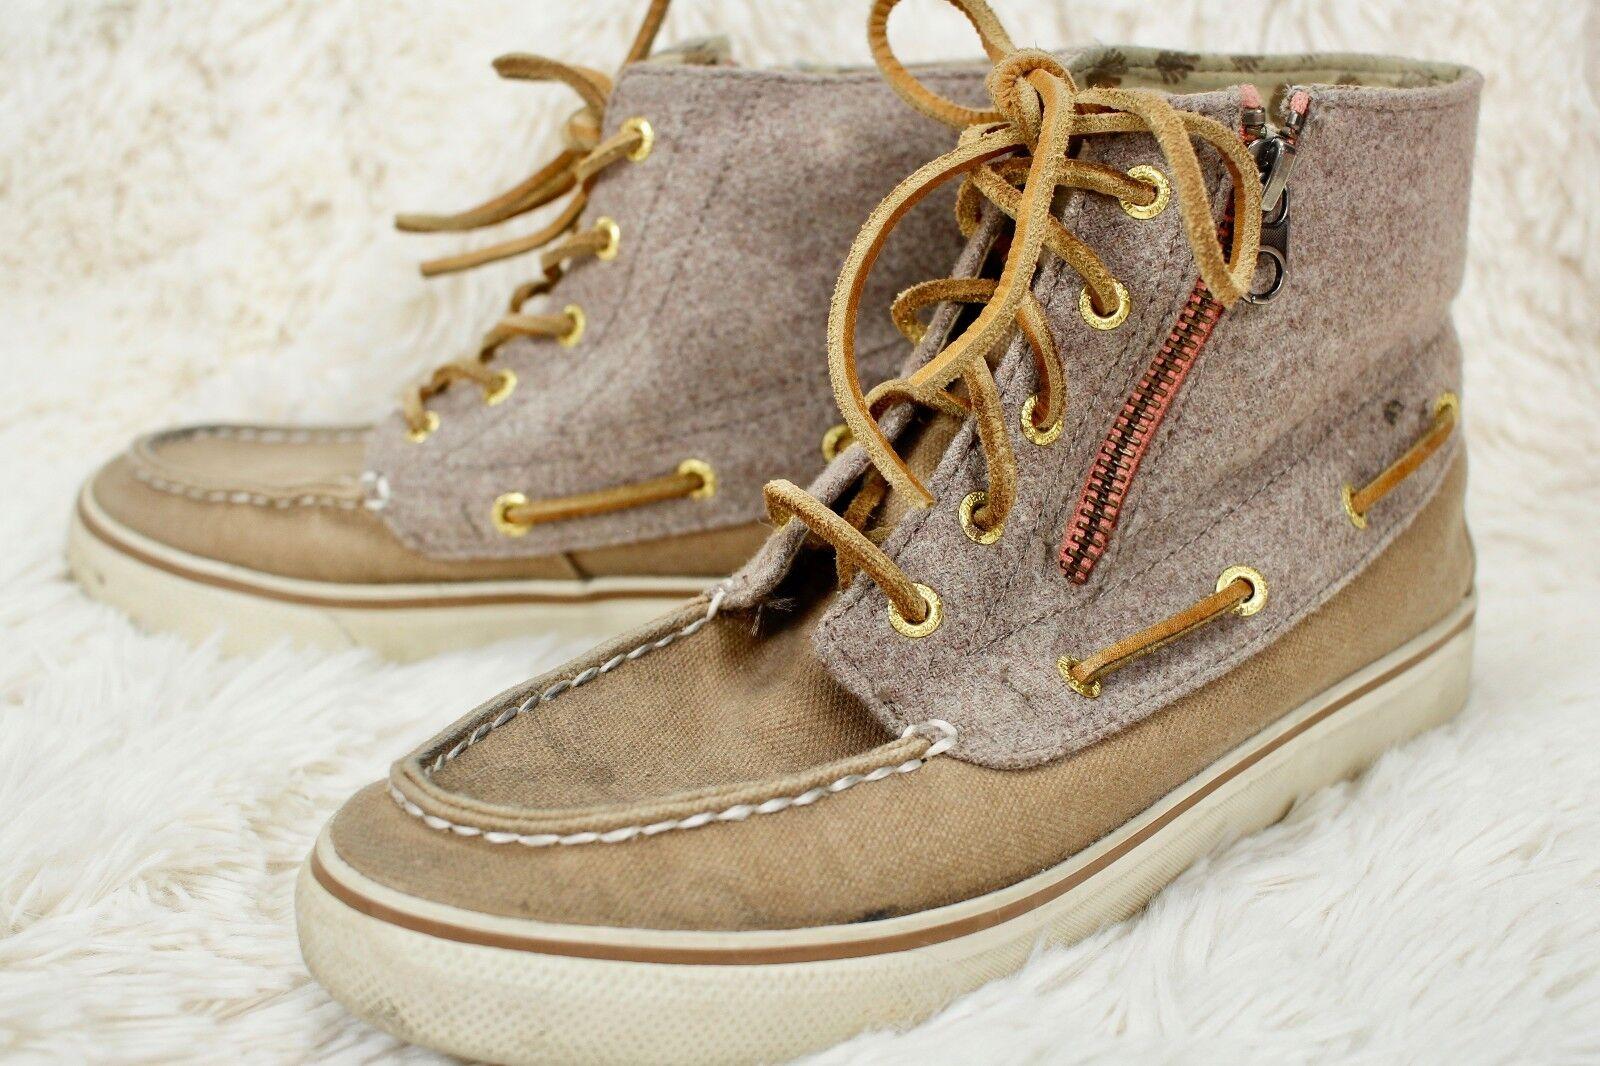 Sperry Top Sider Betty Chukka Boot Sneaker Lace-up Schuhes Größe Damenschuhe Größe Schuhes 7 M Tan 91418f